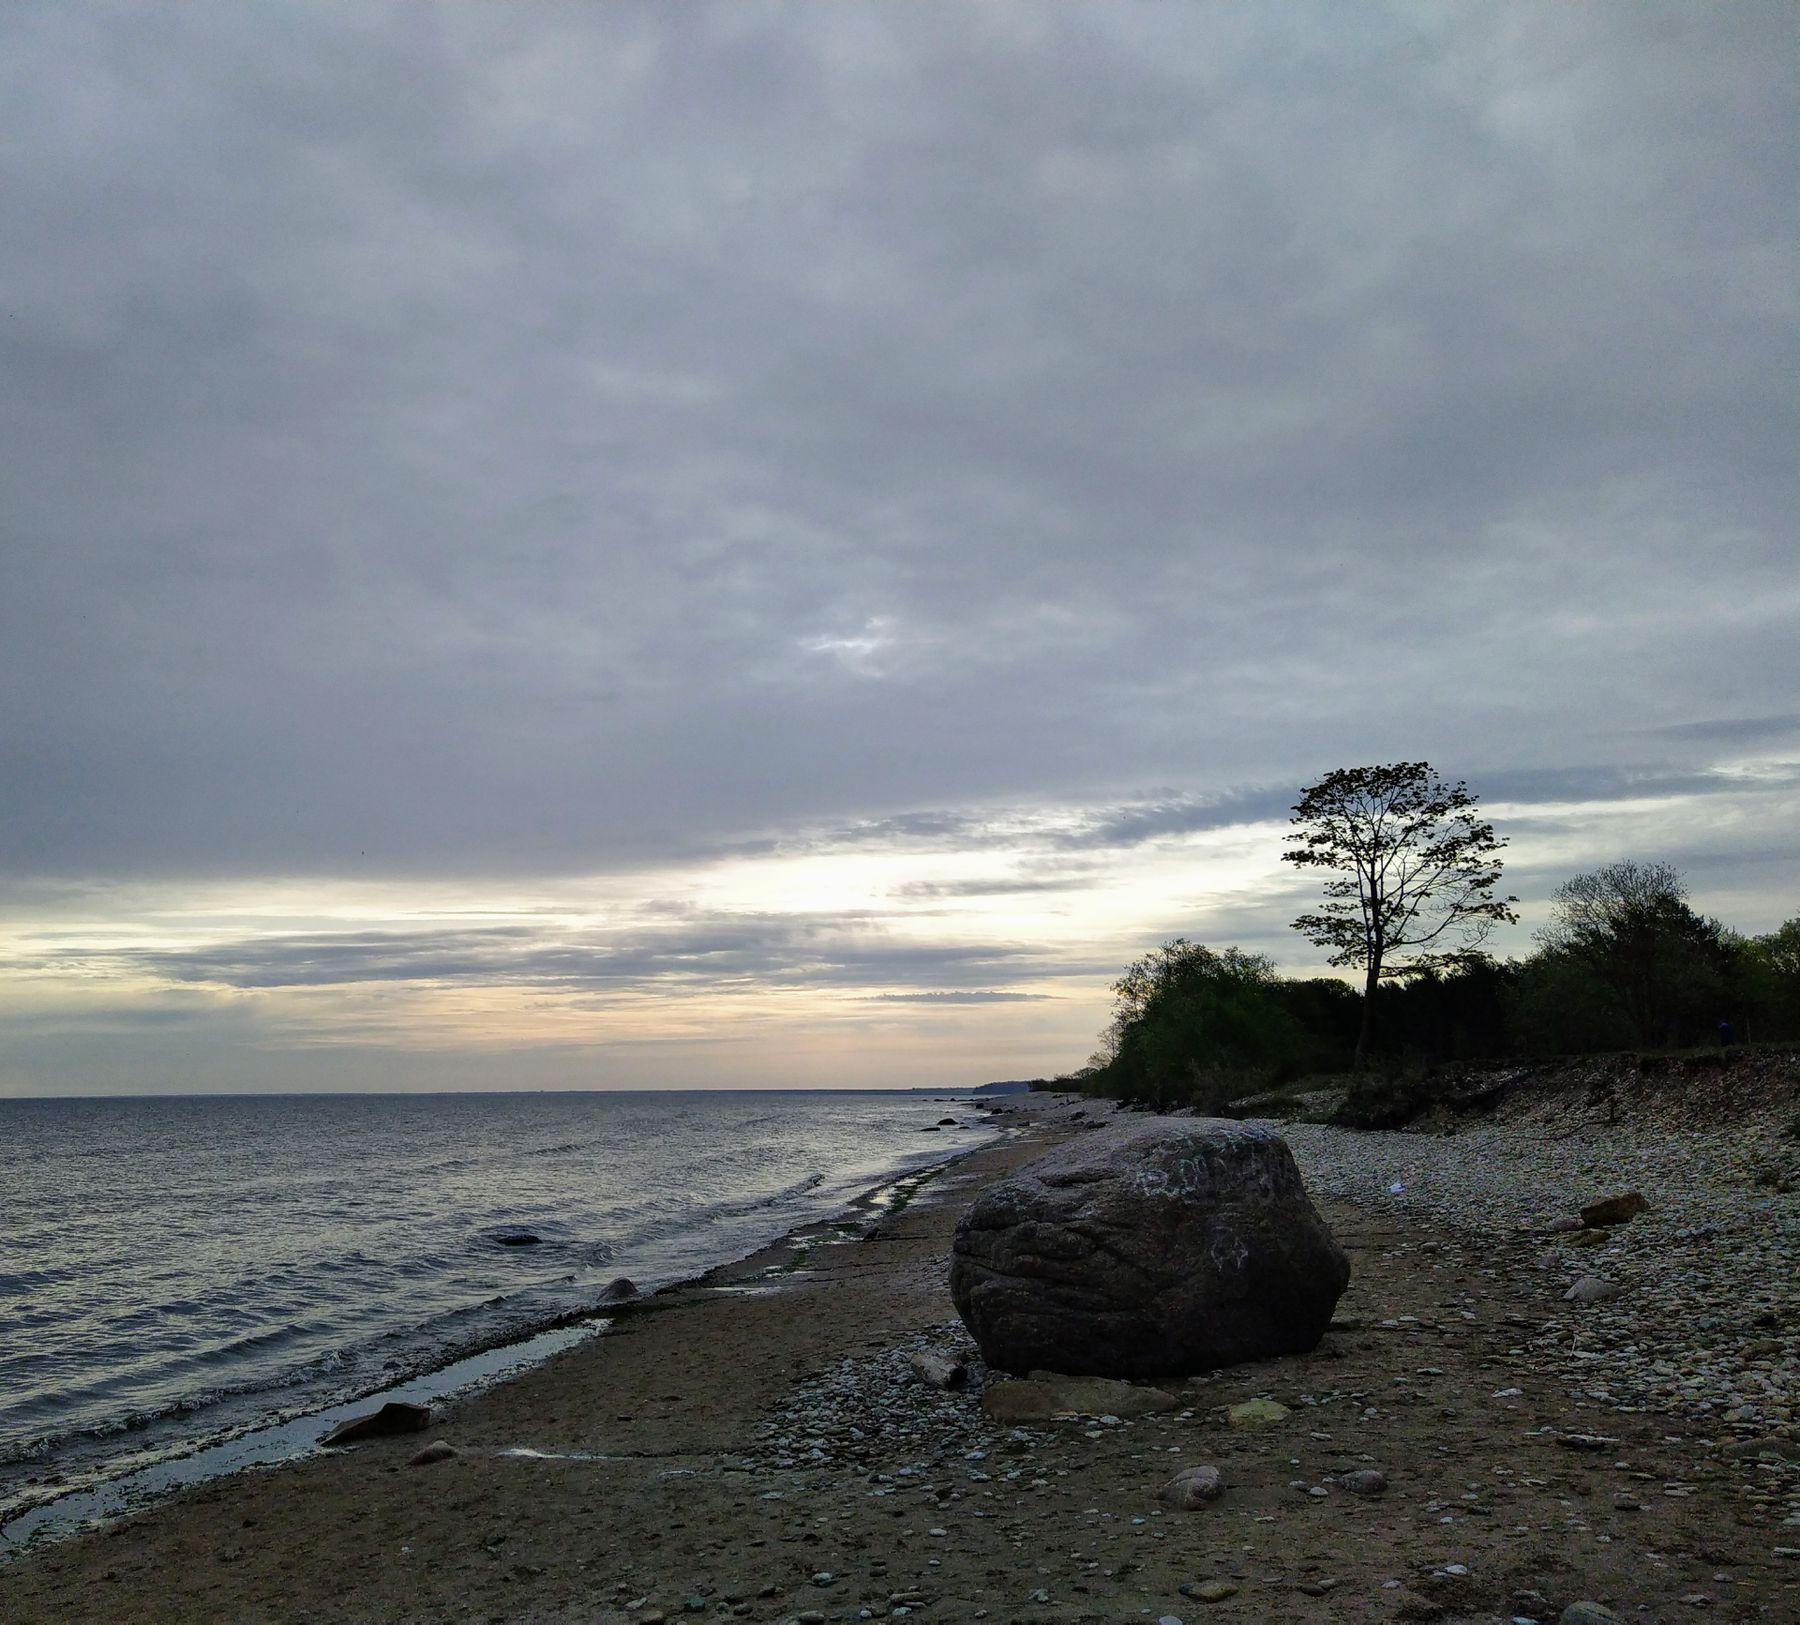 Берег Финского залива, Силламяэ, Эстония. Море